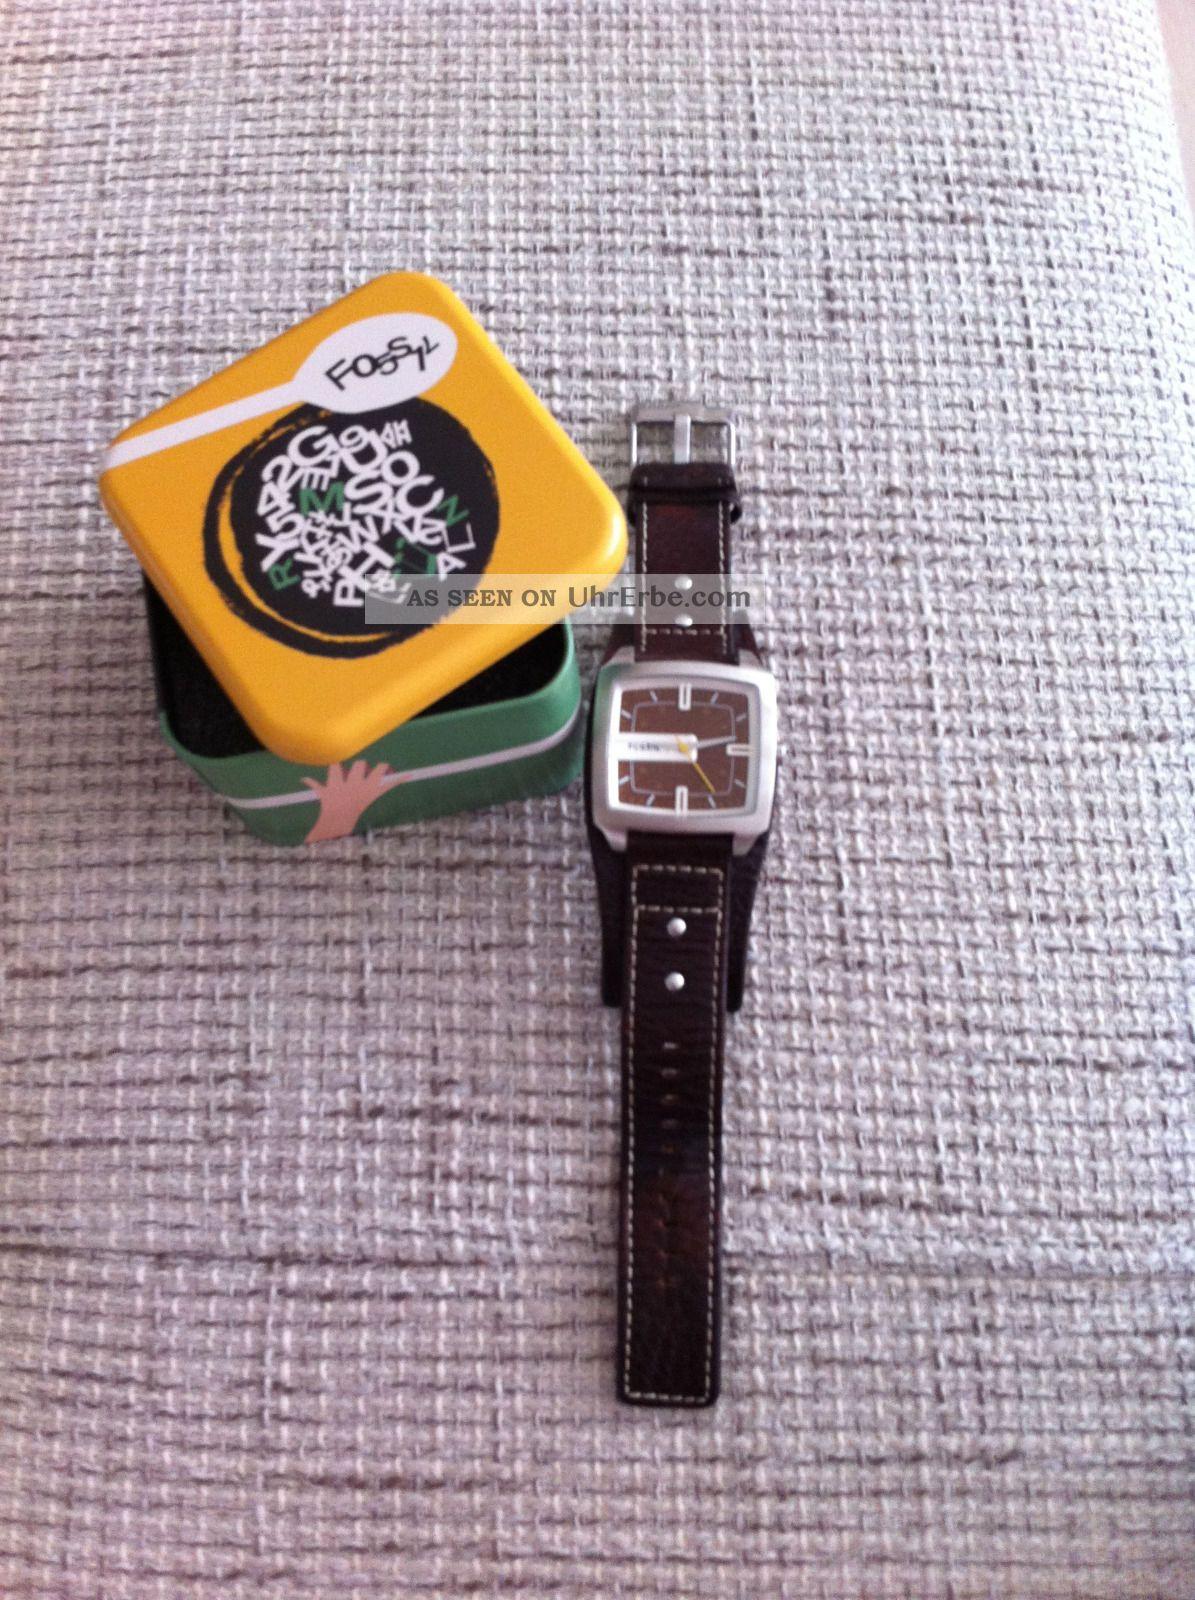 Fossil Herrenuhr Jr 9990 Armbanduhren Bild